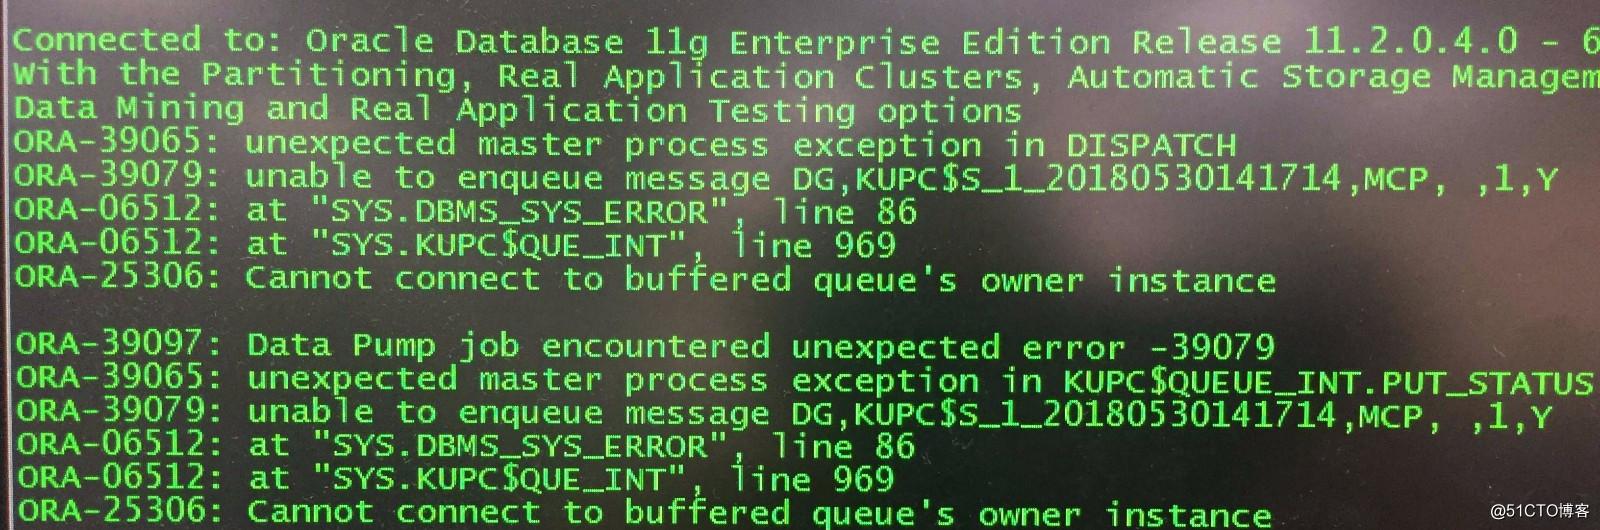 RAC11g使用数据泵导入导出报ORA-6512,ORA-25306,ORA-39079错